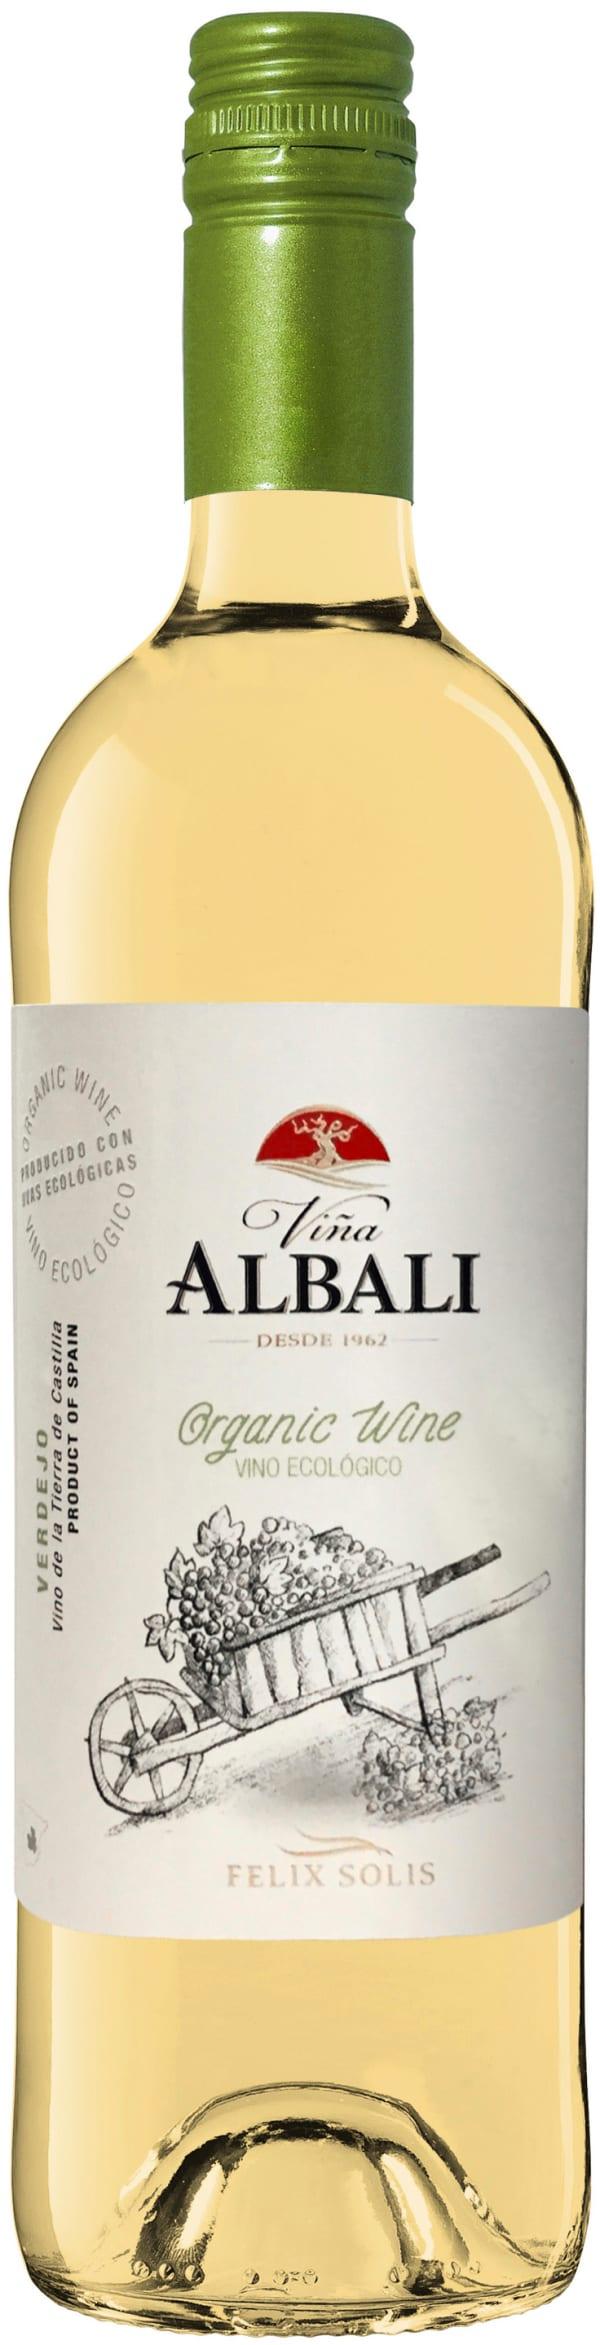 Viña Albali Verdejo Organic 2019